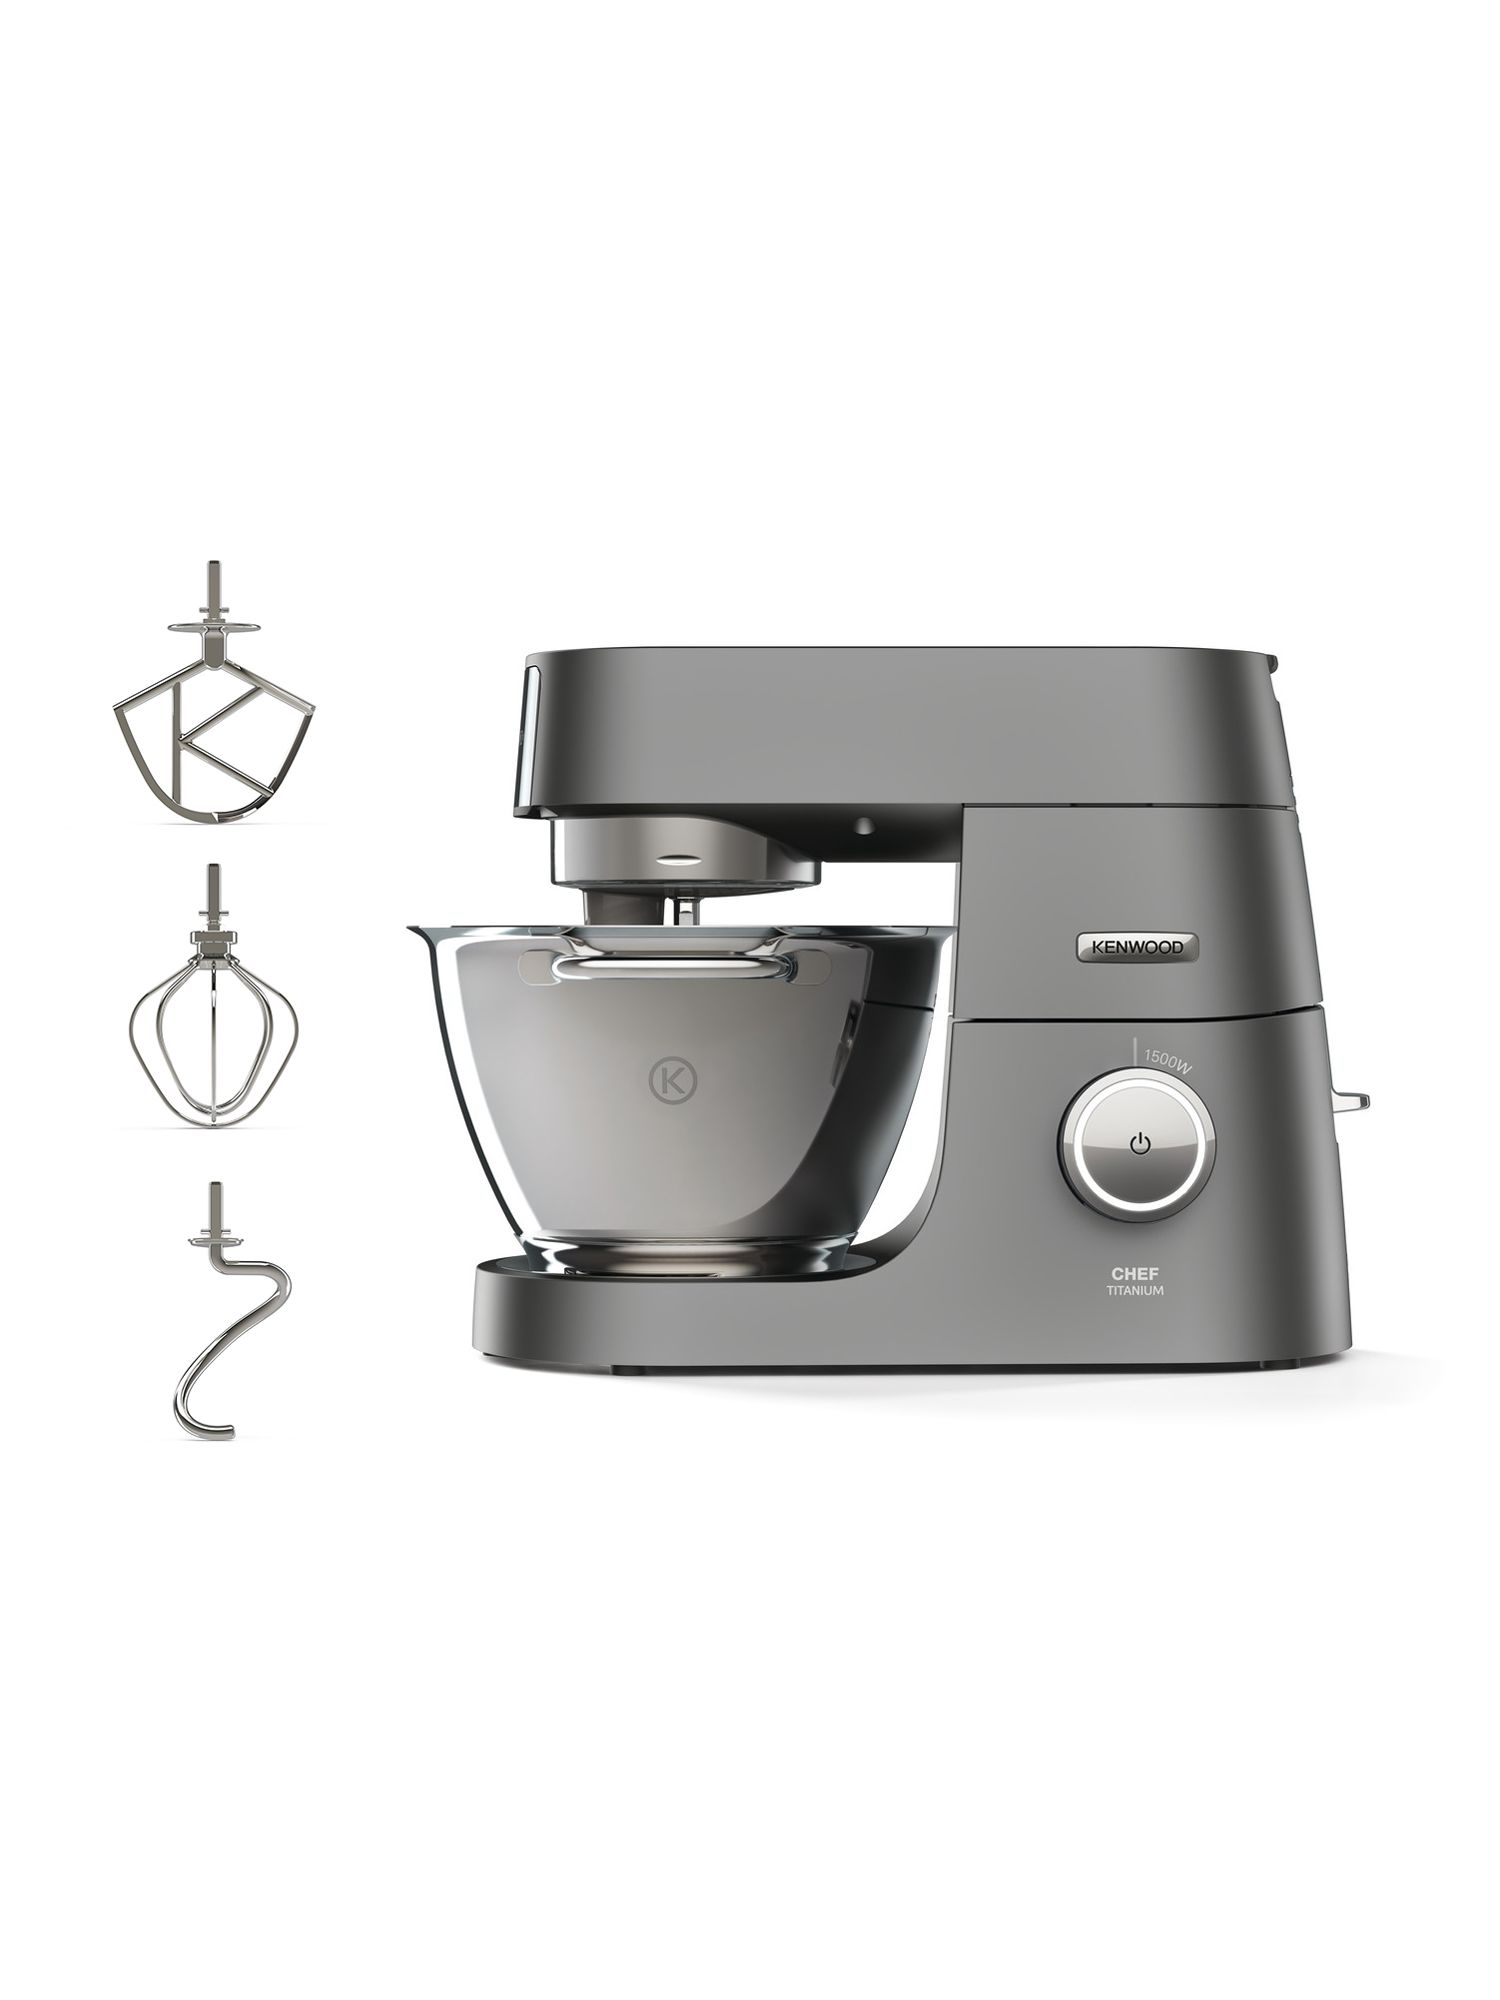 Kenwood Kenwood KVC7300S Chef Titanium Stand Mixer, Silver